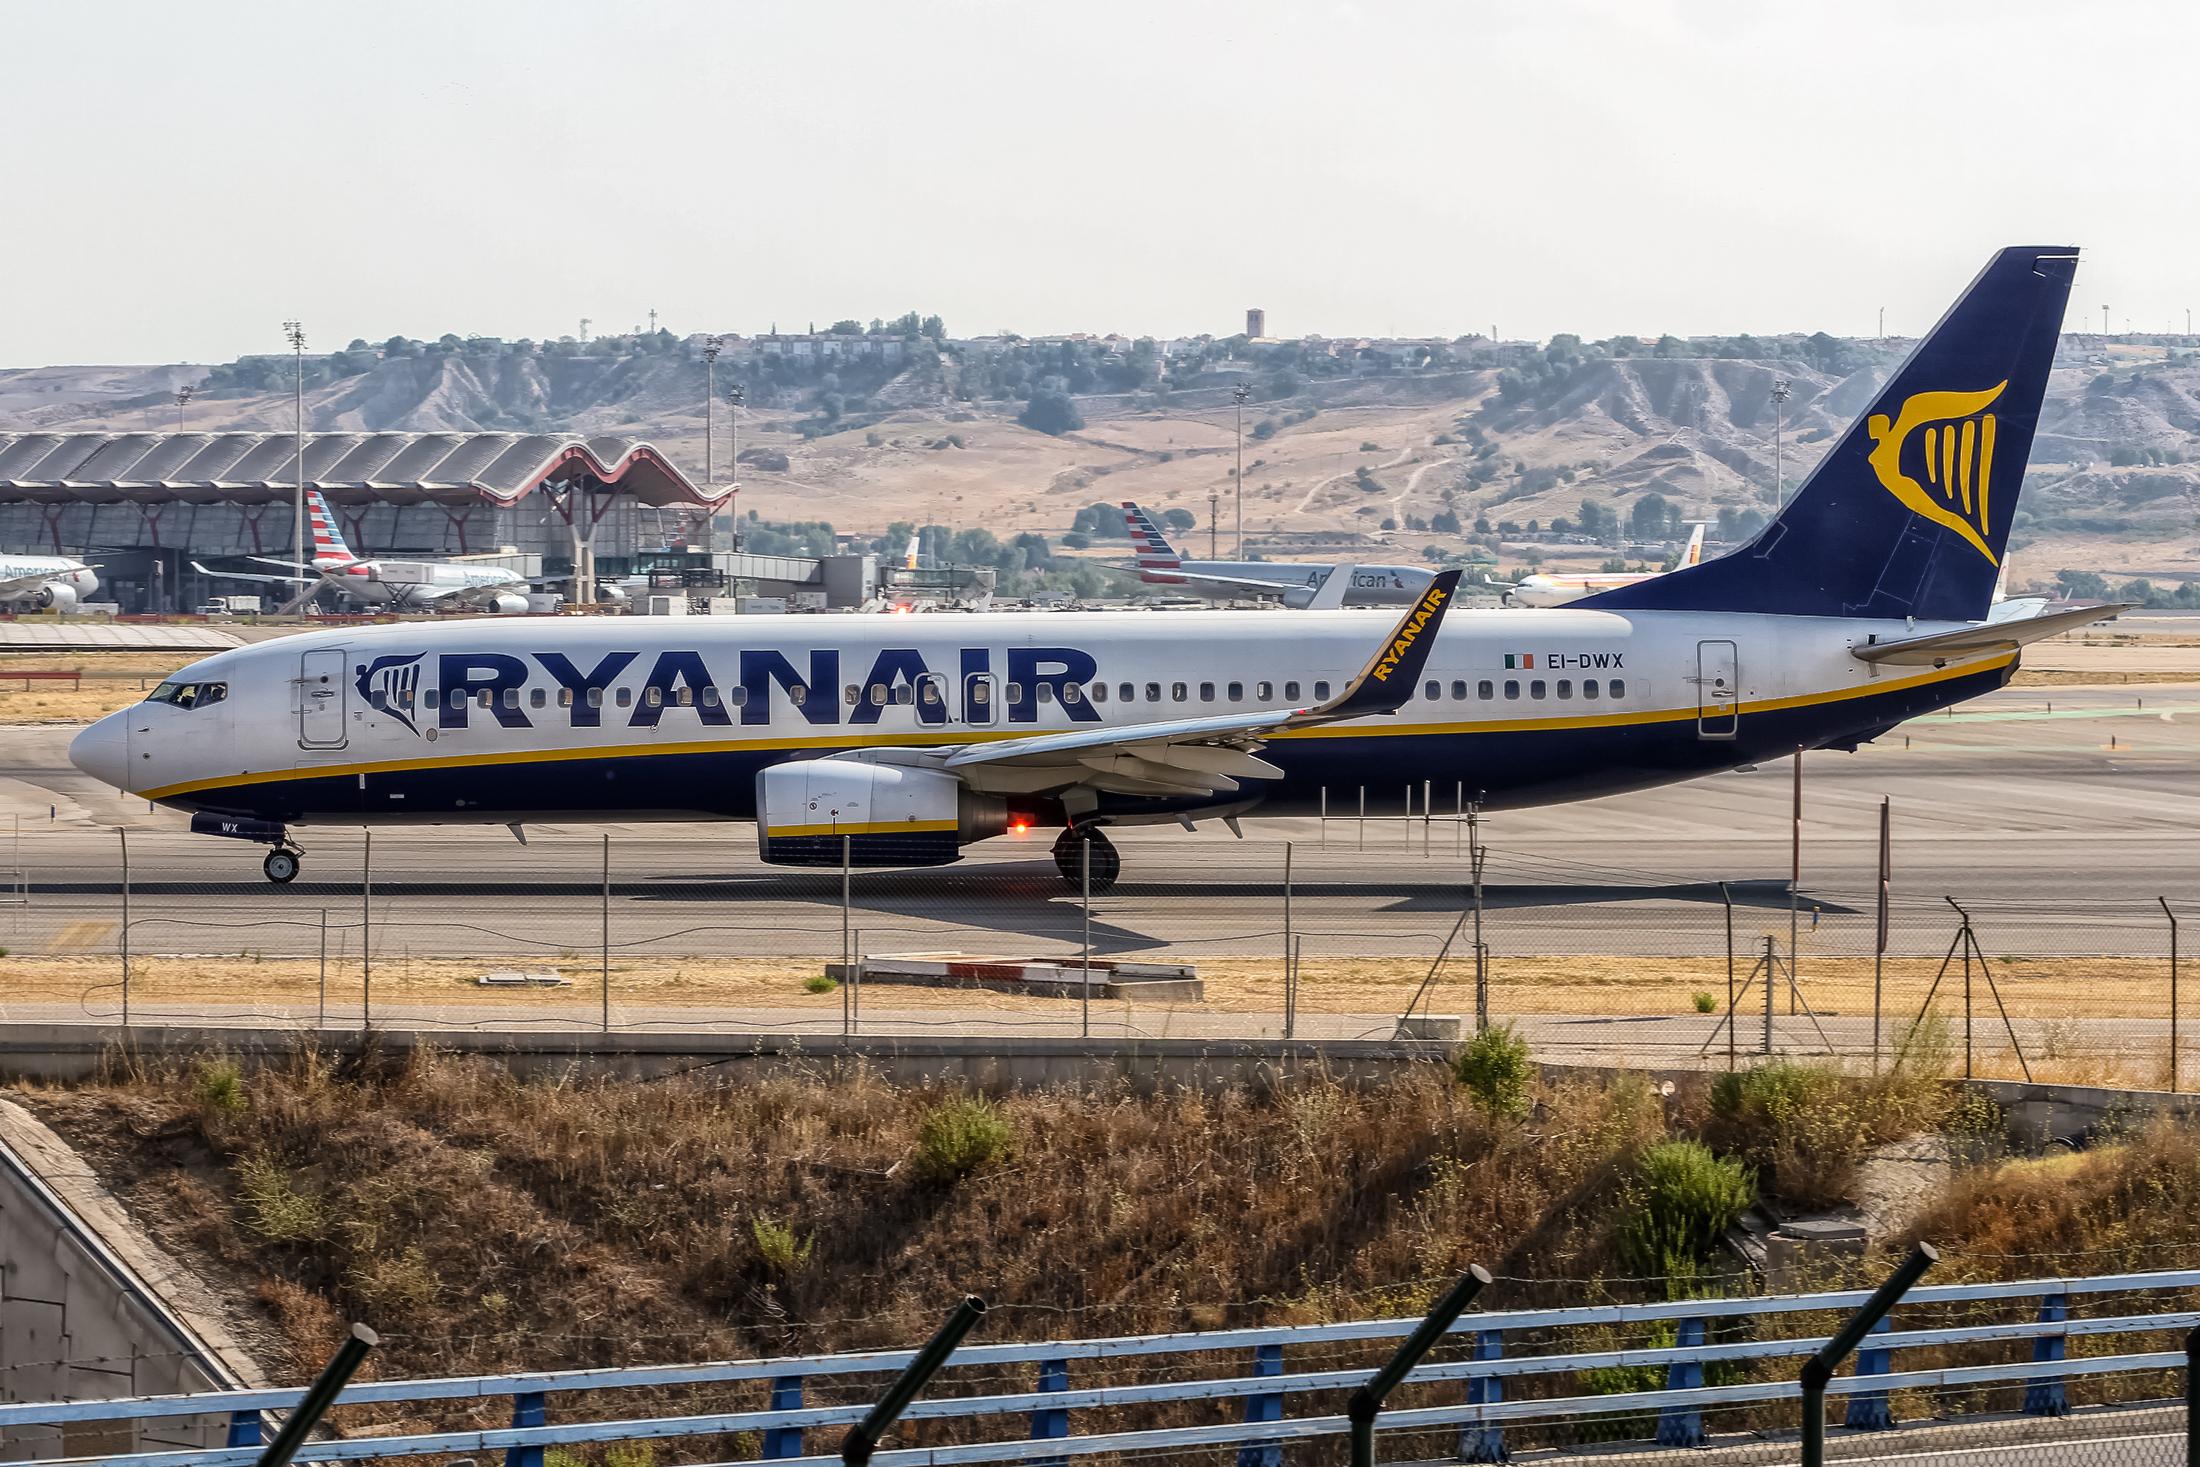 Ryanair Boeing 737-800 i Palma de Mallorca Airport. (Foto: Oliver Holzbauer | CC 2.0)